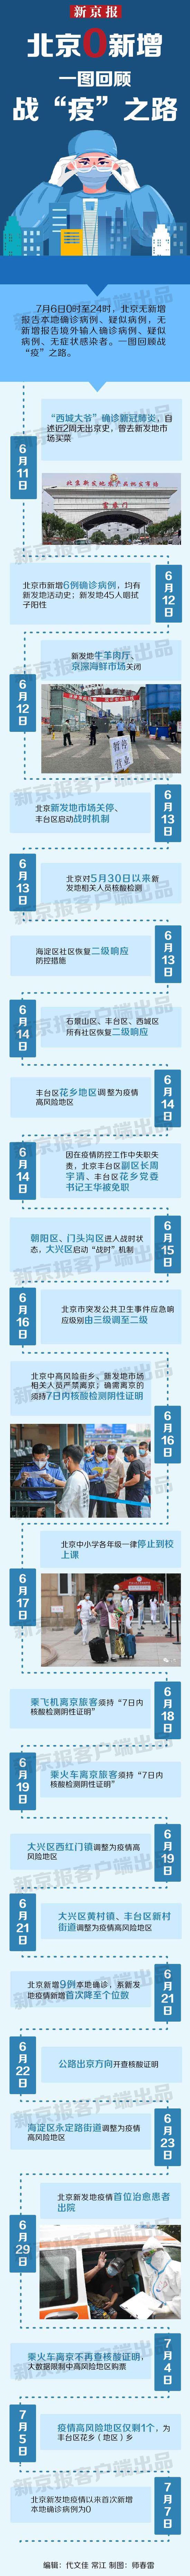 【sky平台】北京sky平台0新增一图图片